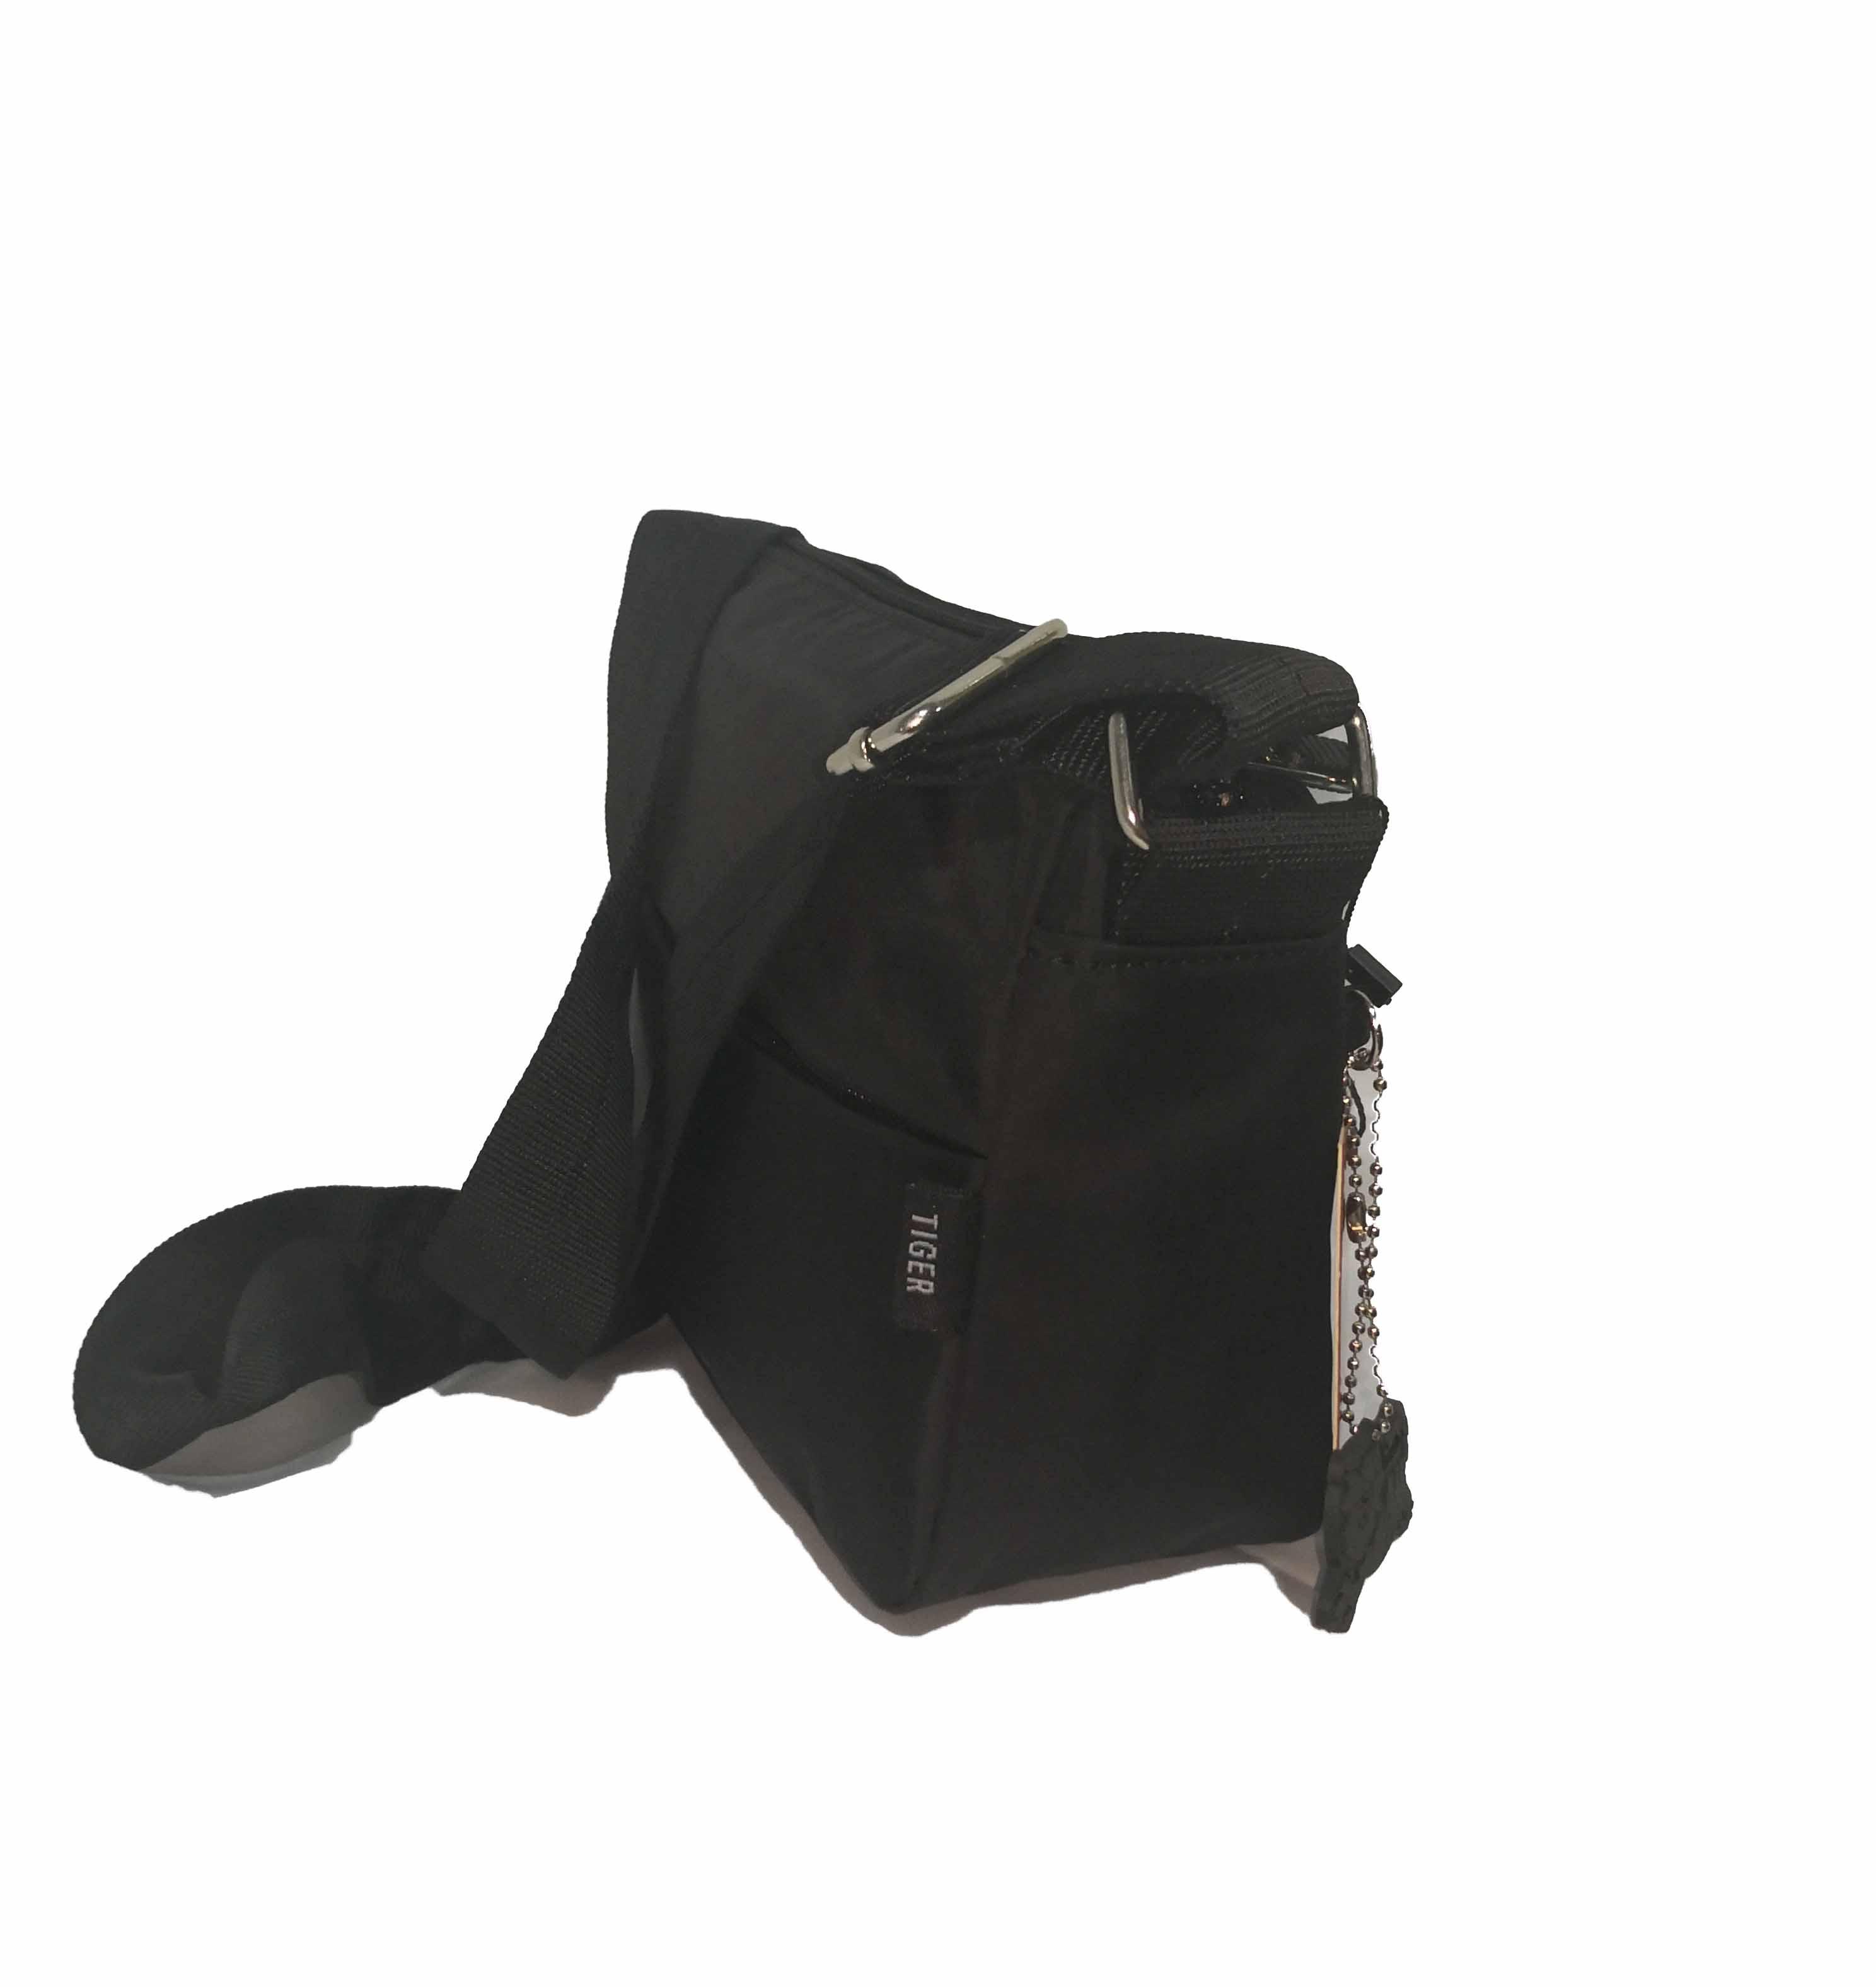 171f0822e96 Bolso pequeño negro Young Sport Line Tiger - Tienda de Bolsos Online ...